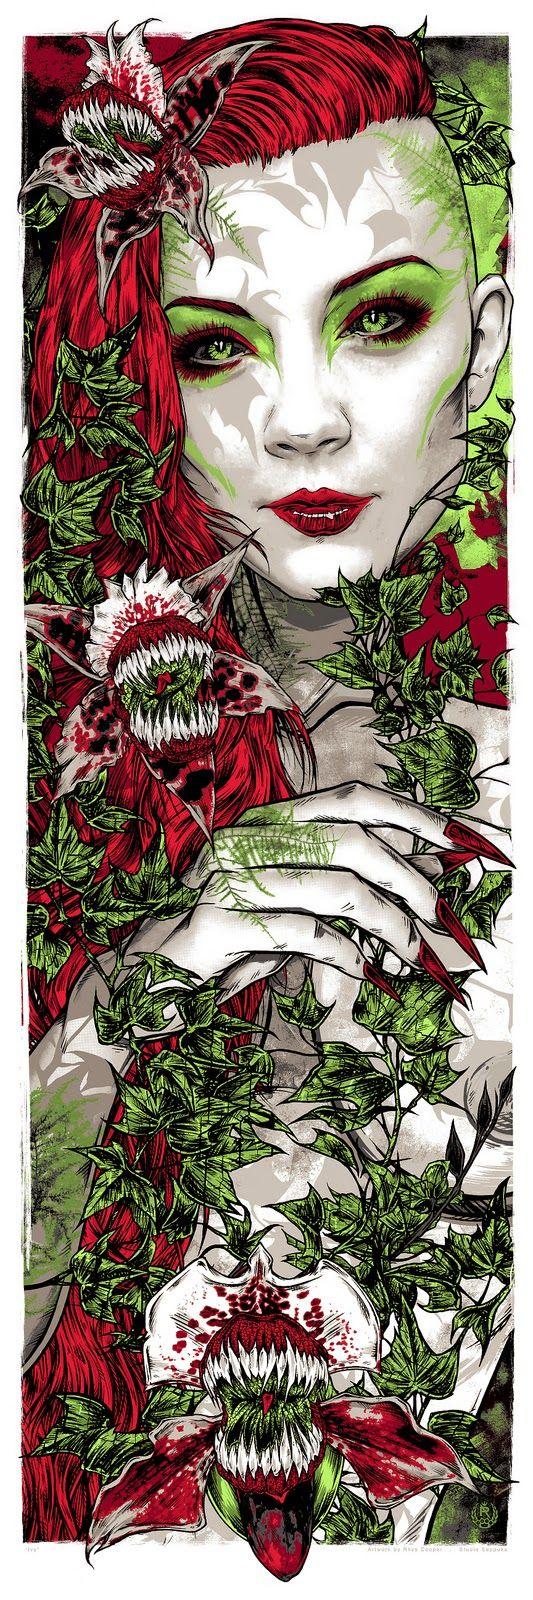 One Line Ascii Art Batman : Best one line ascii art ideas on pinterest